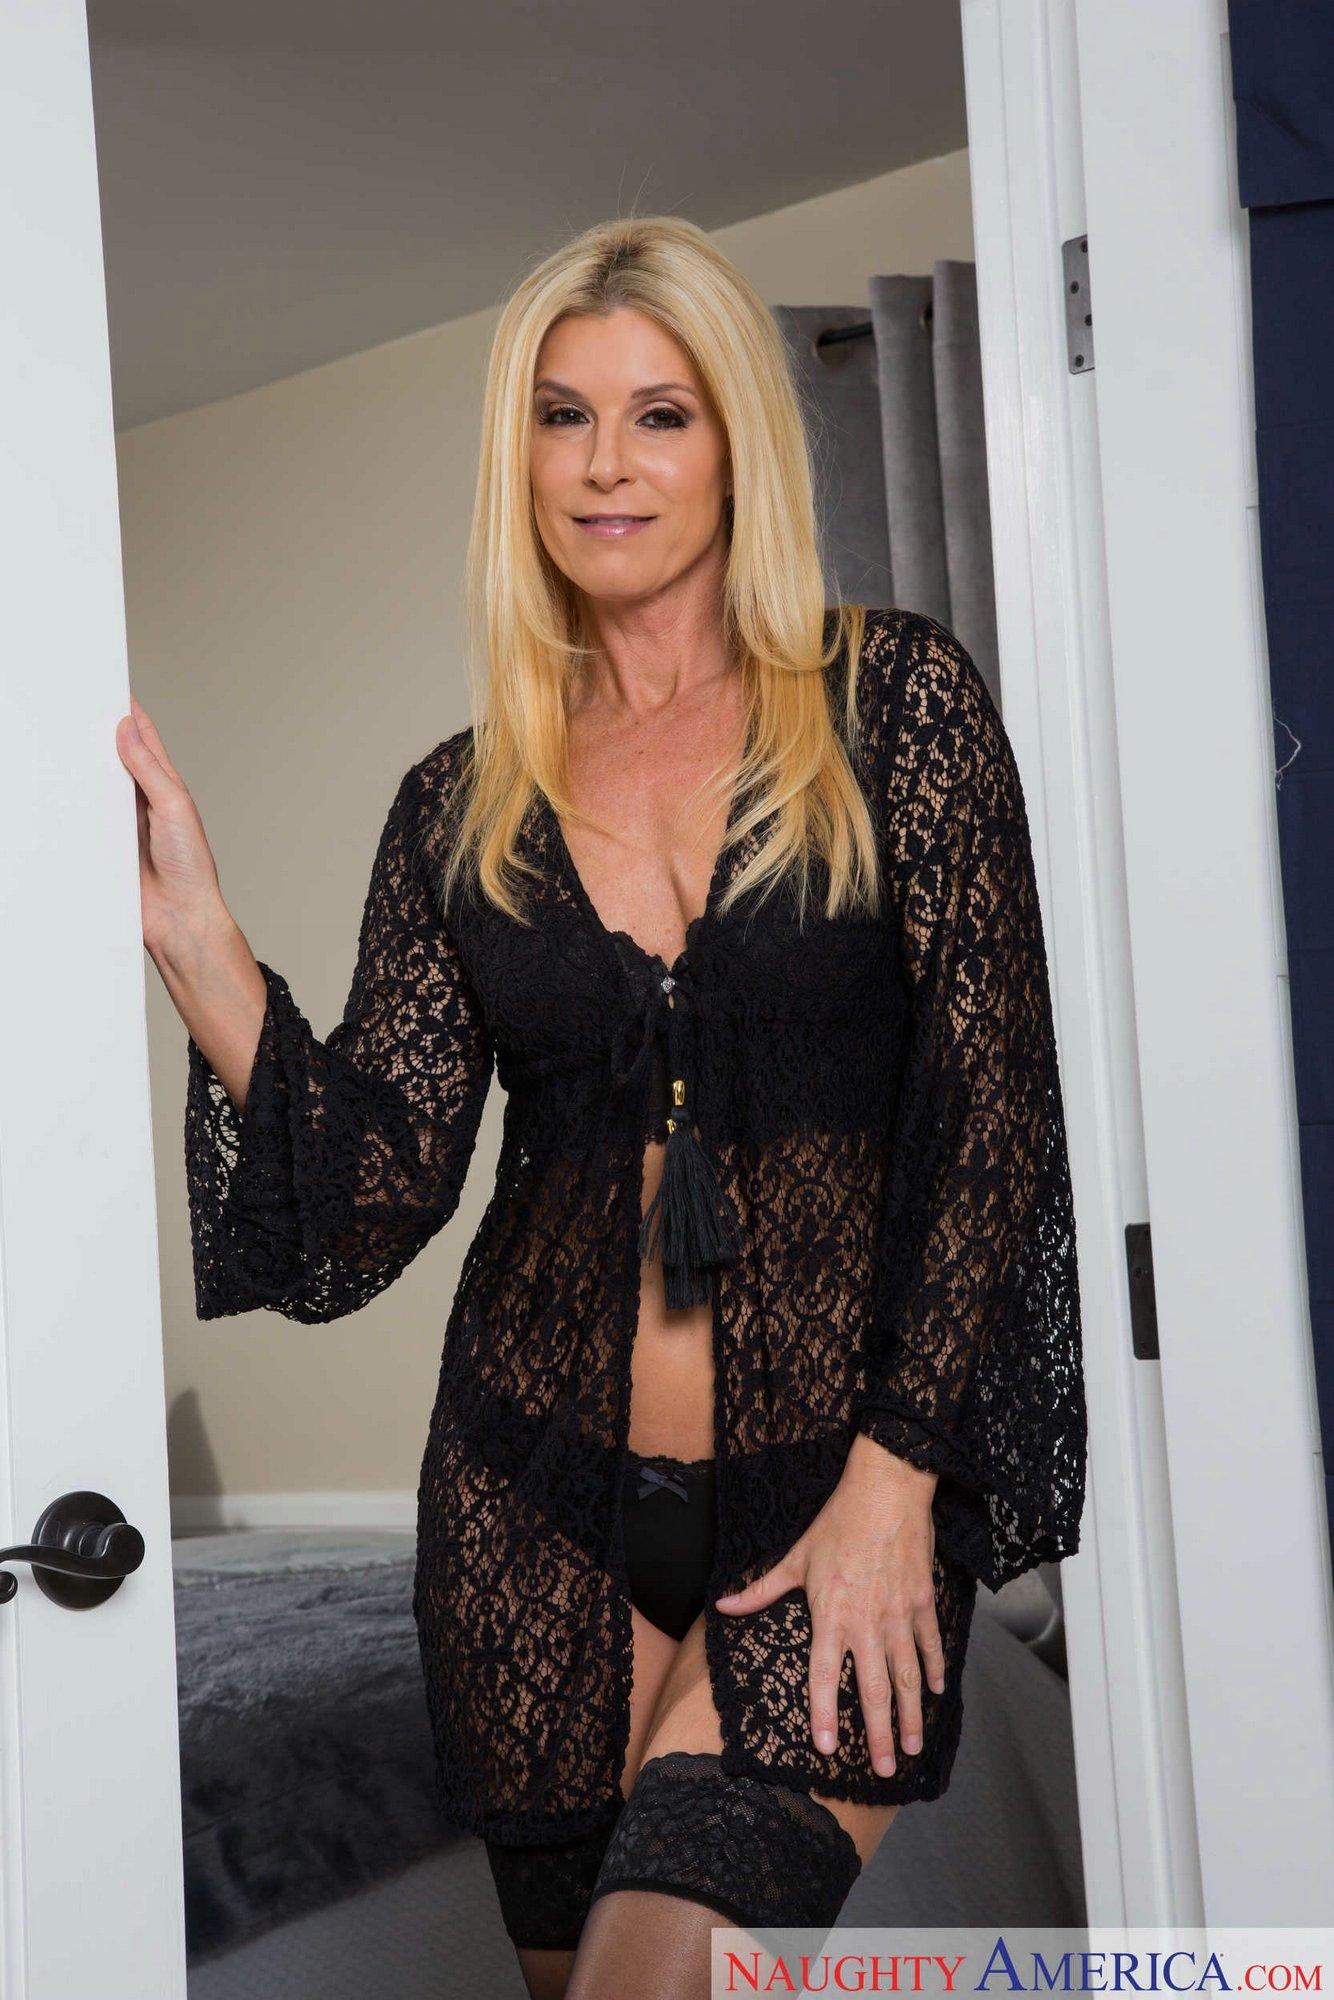 Curious naughty america blonde black dress